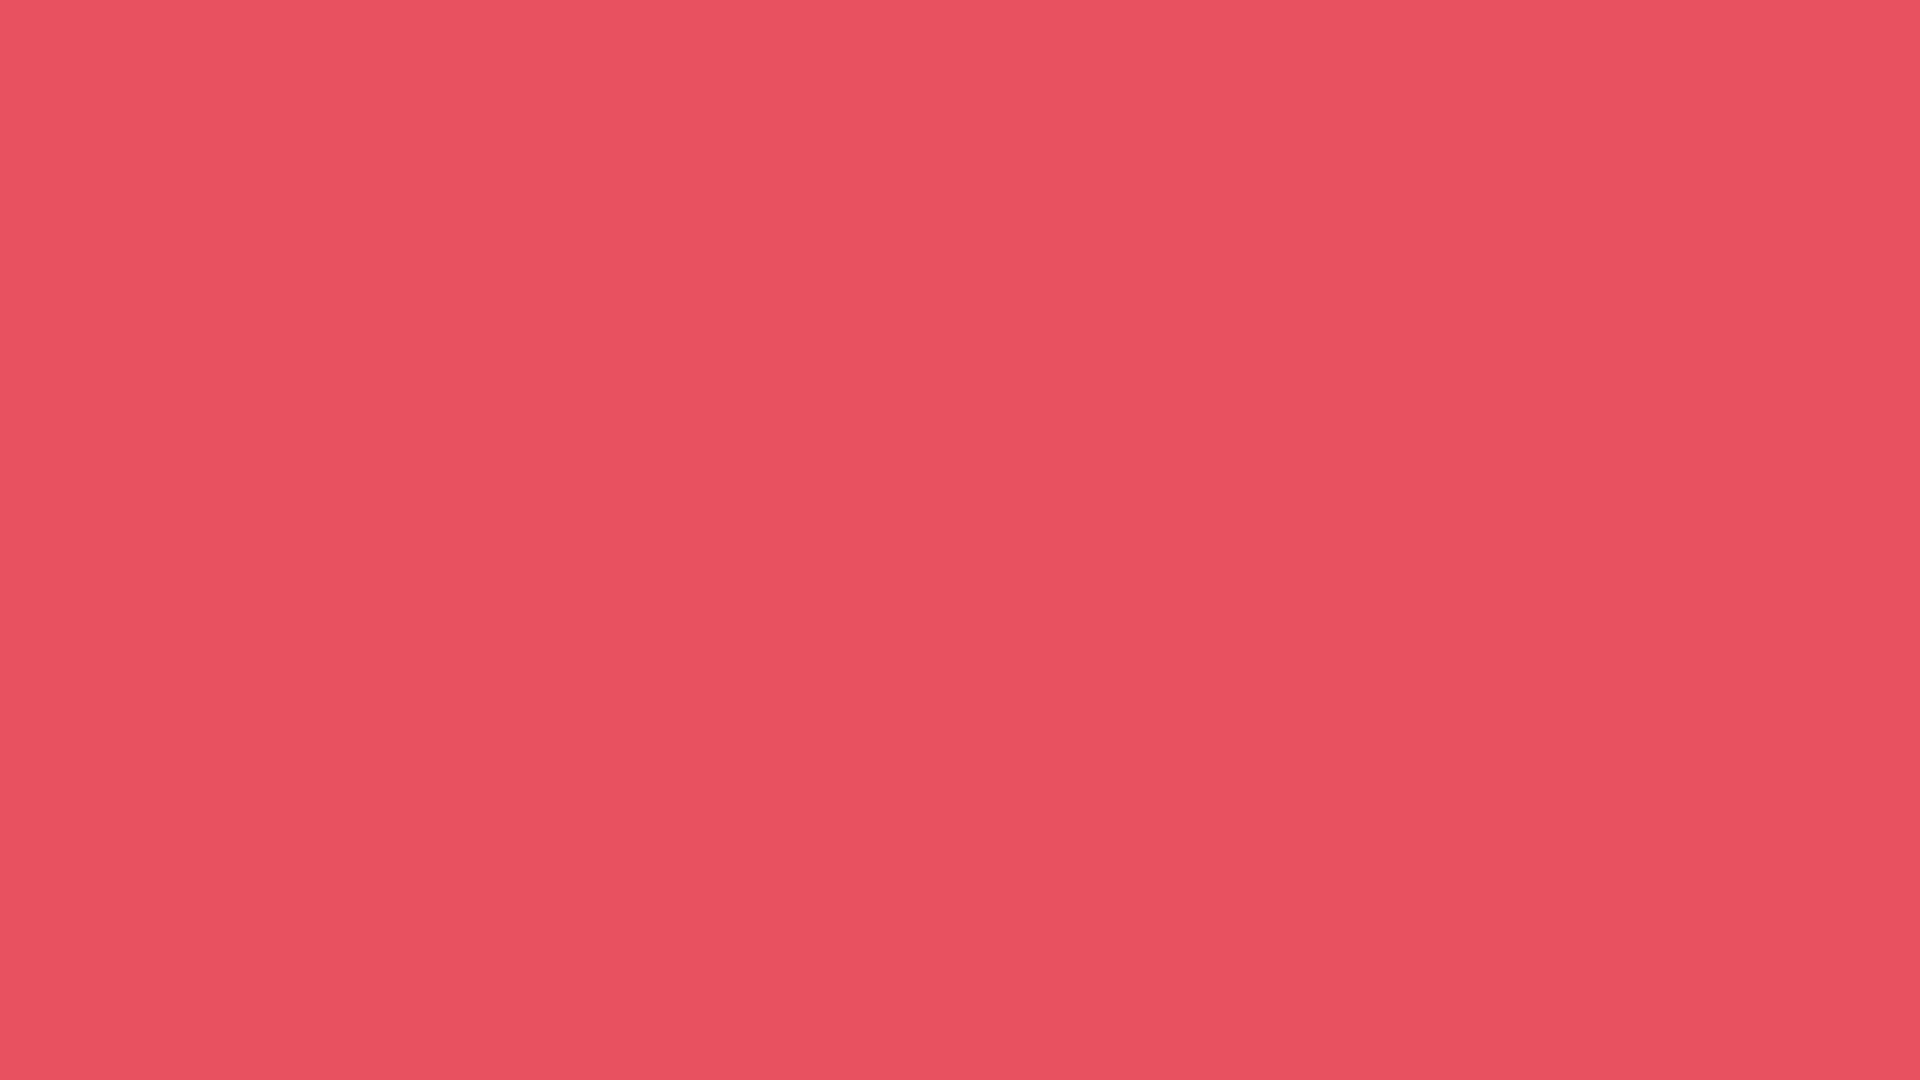 logo_motion_02.mp4